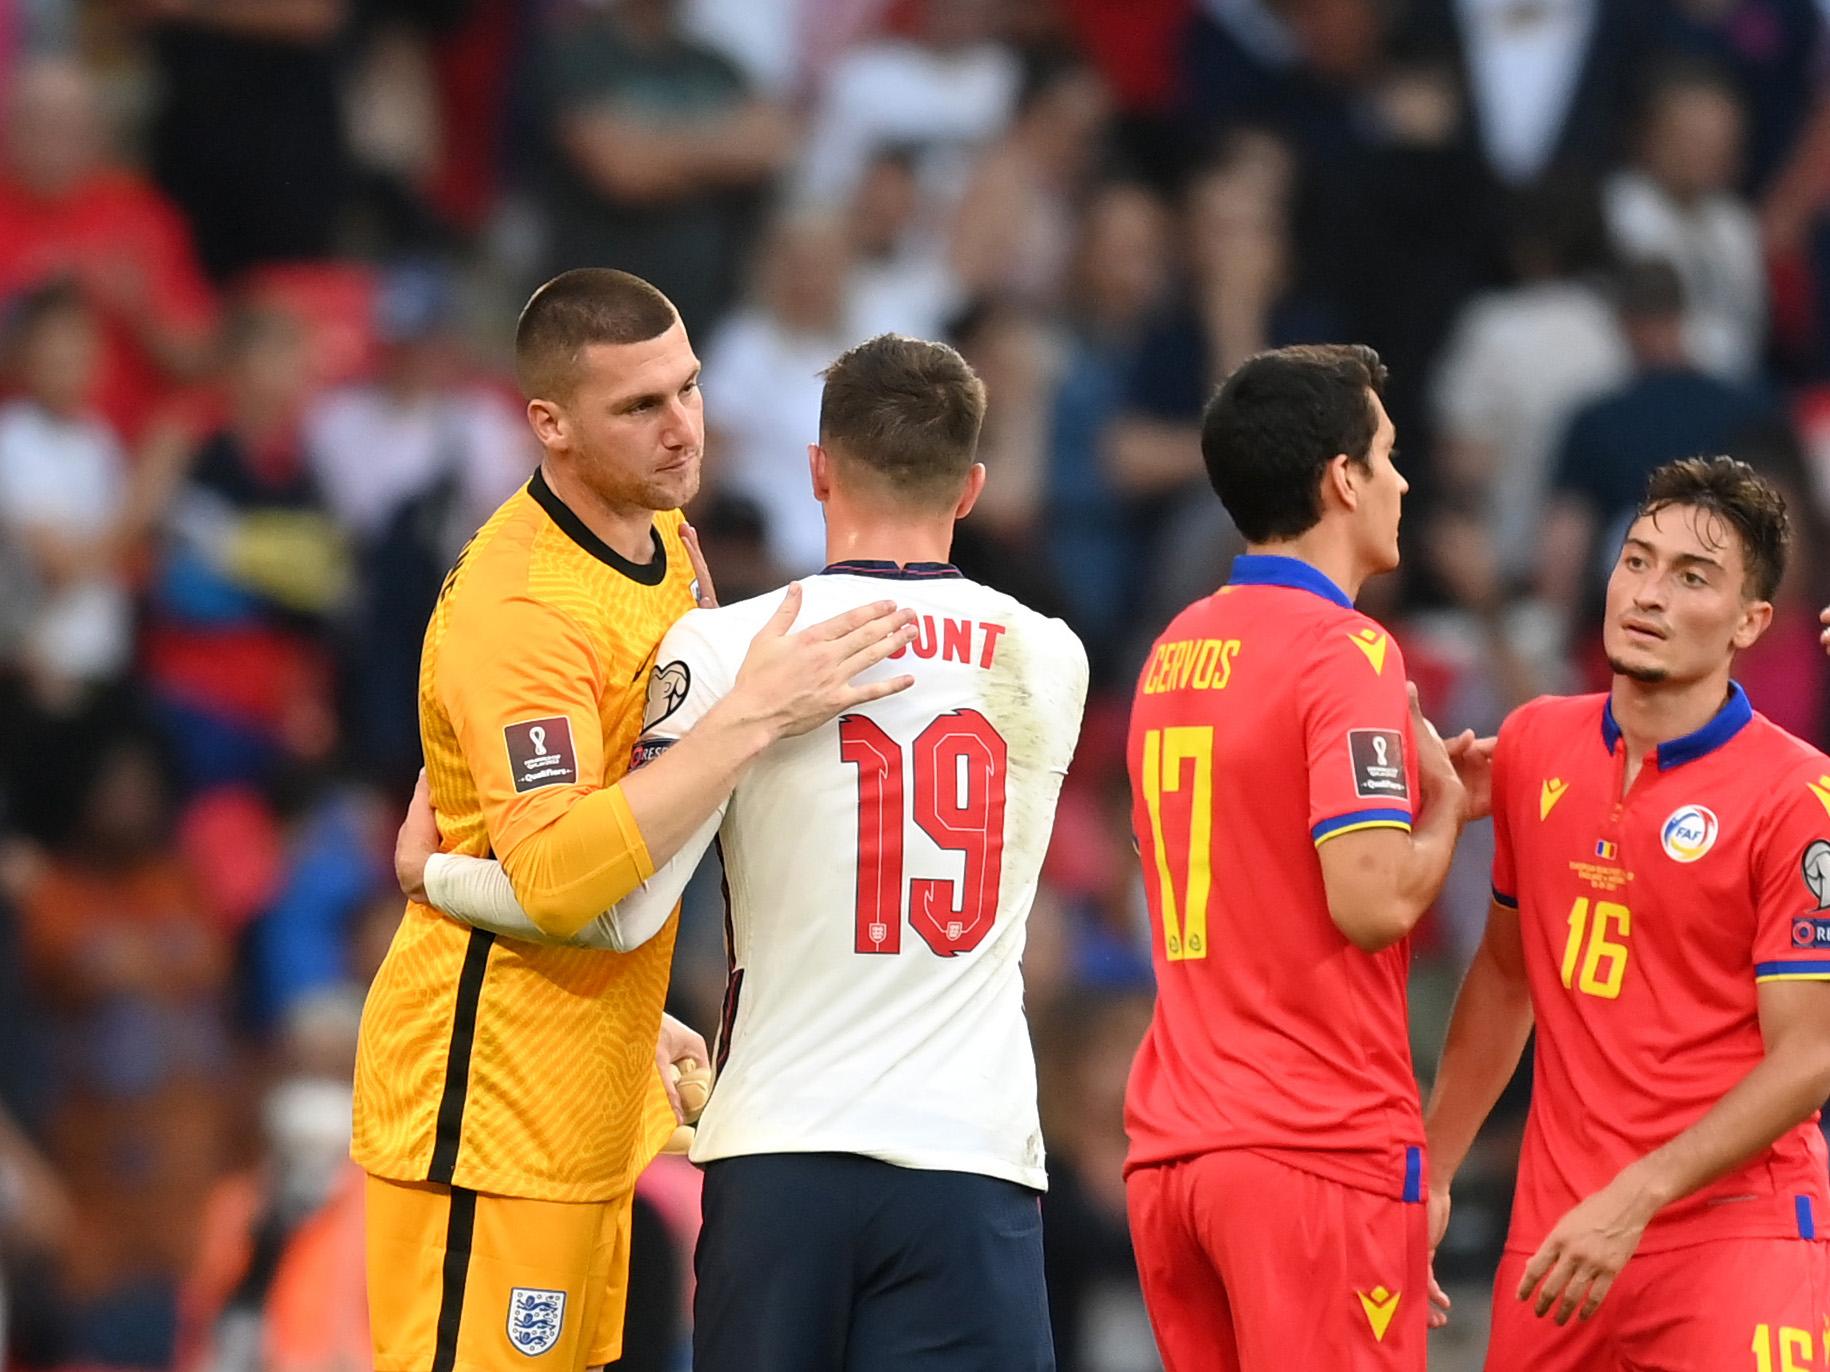 Johnstone England Andorra away